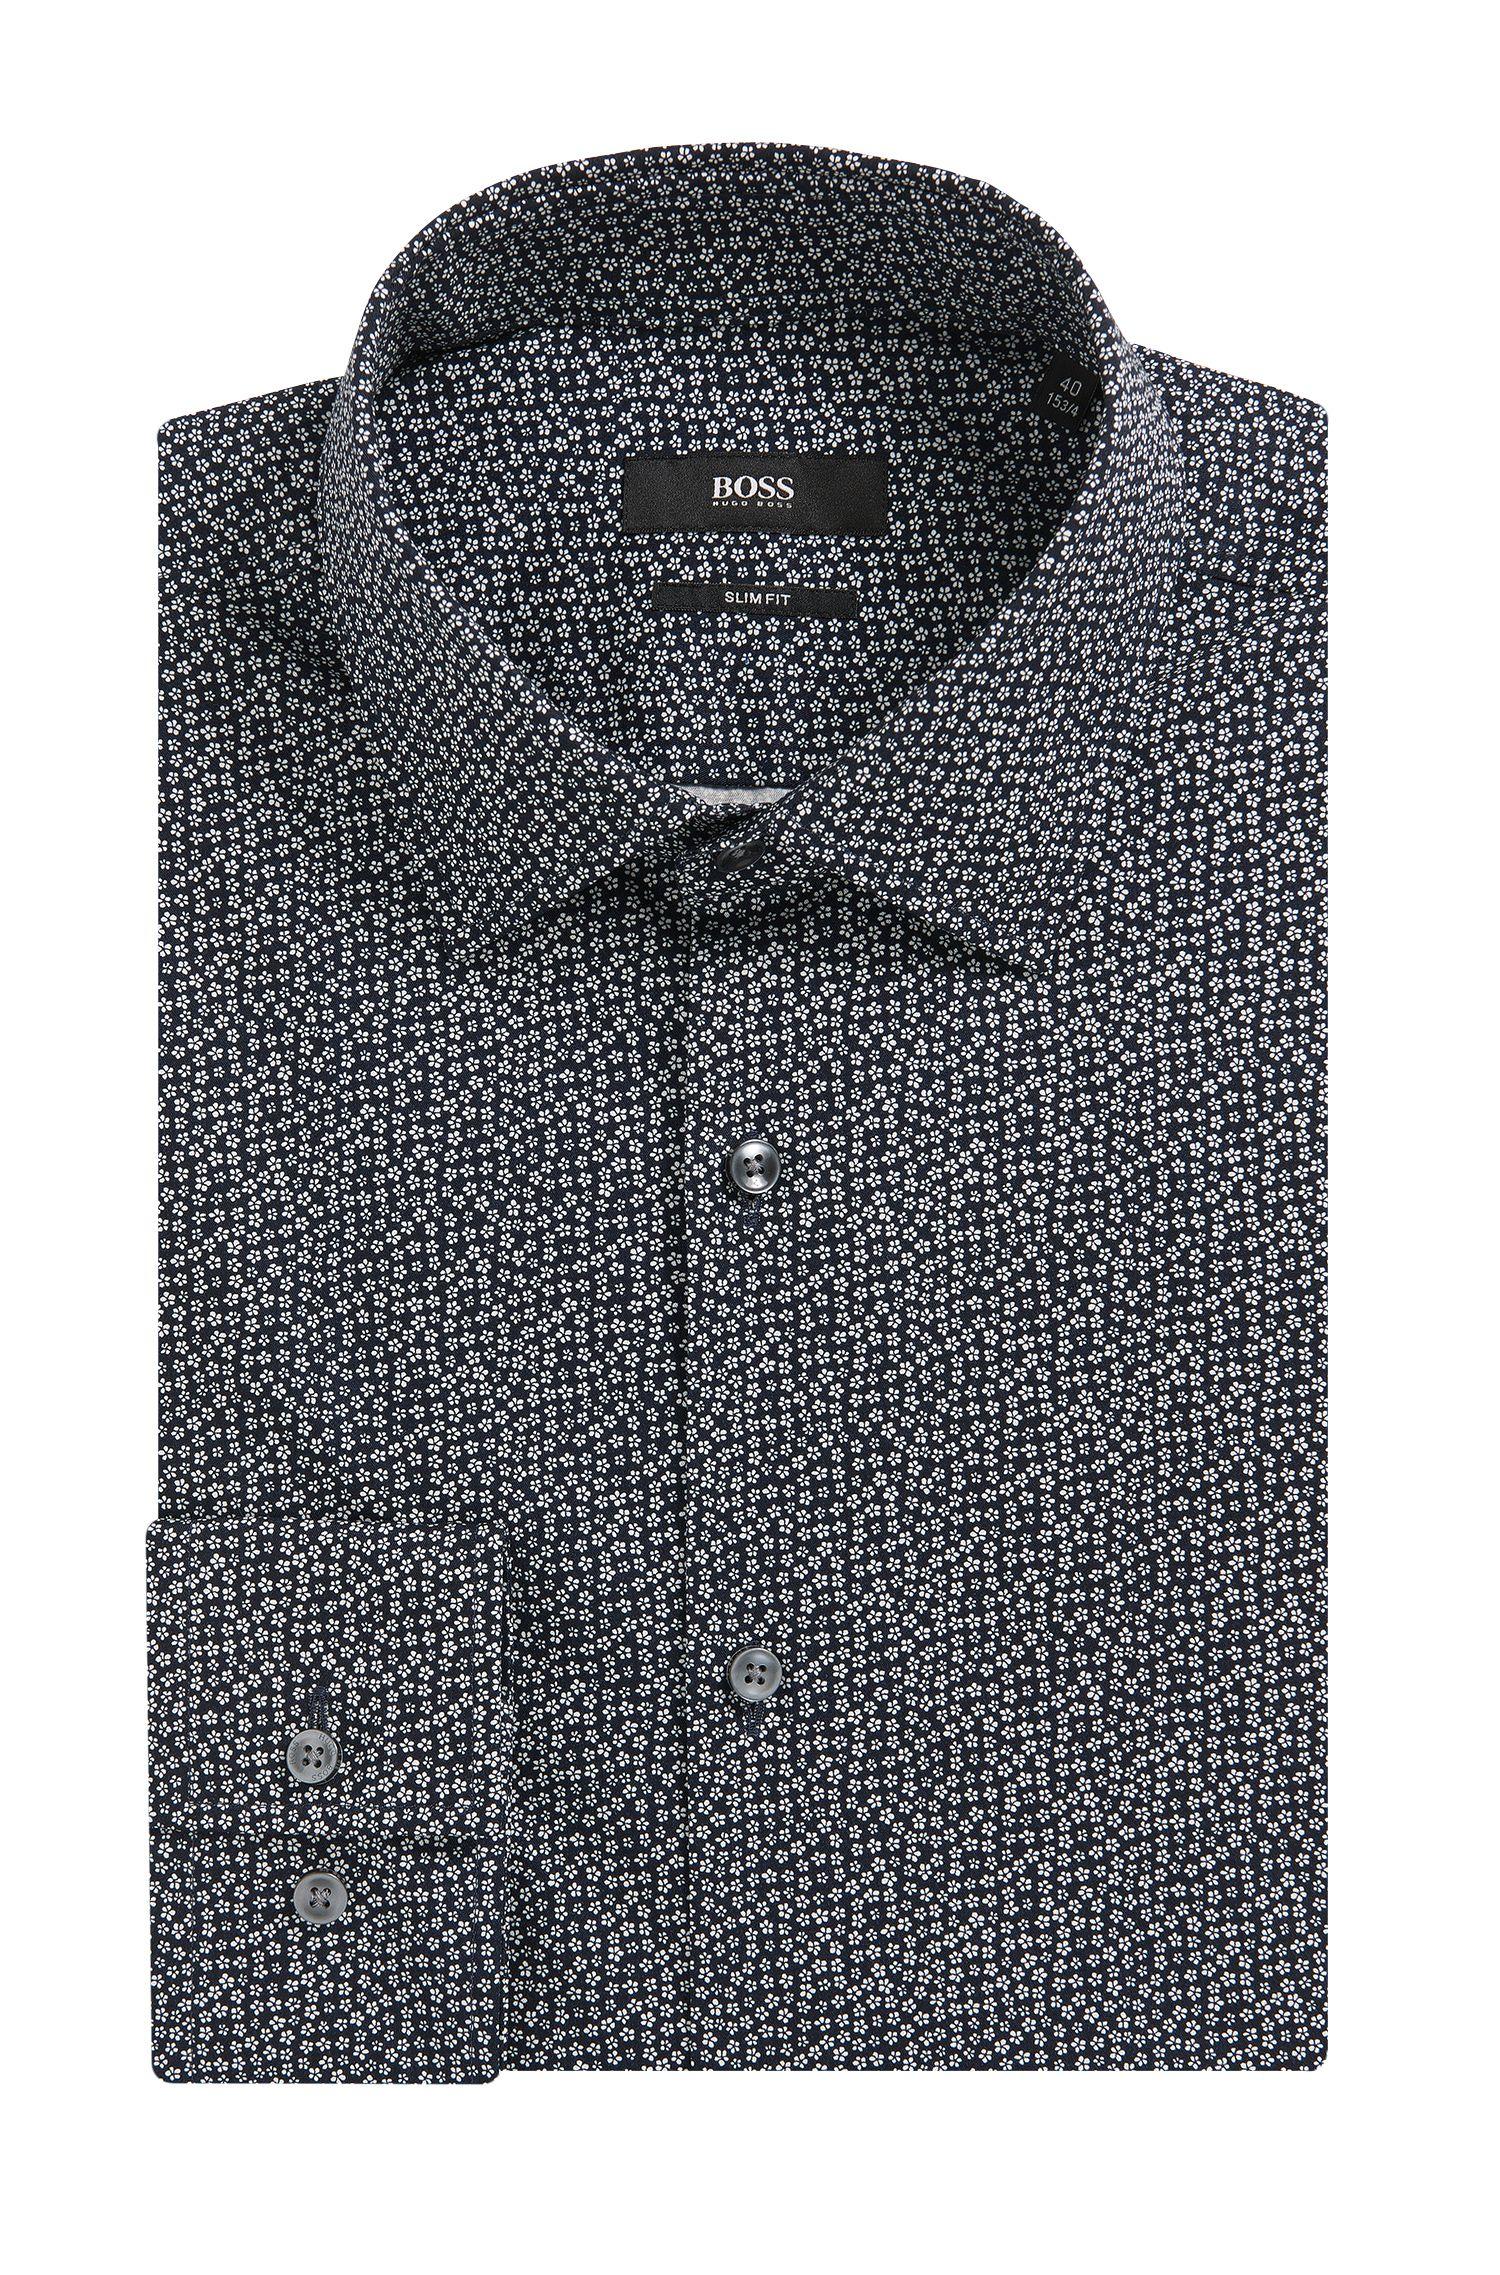 'Jenno' | Slim Fit, Flower-Print Cotton Dress Shirt